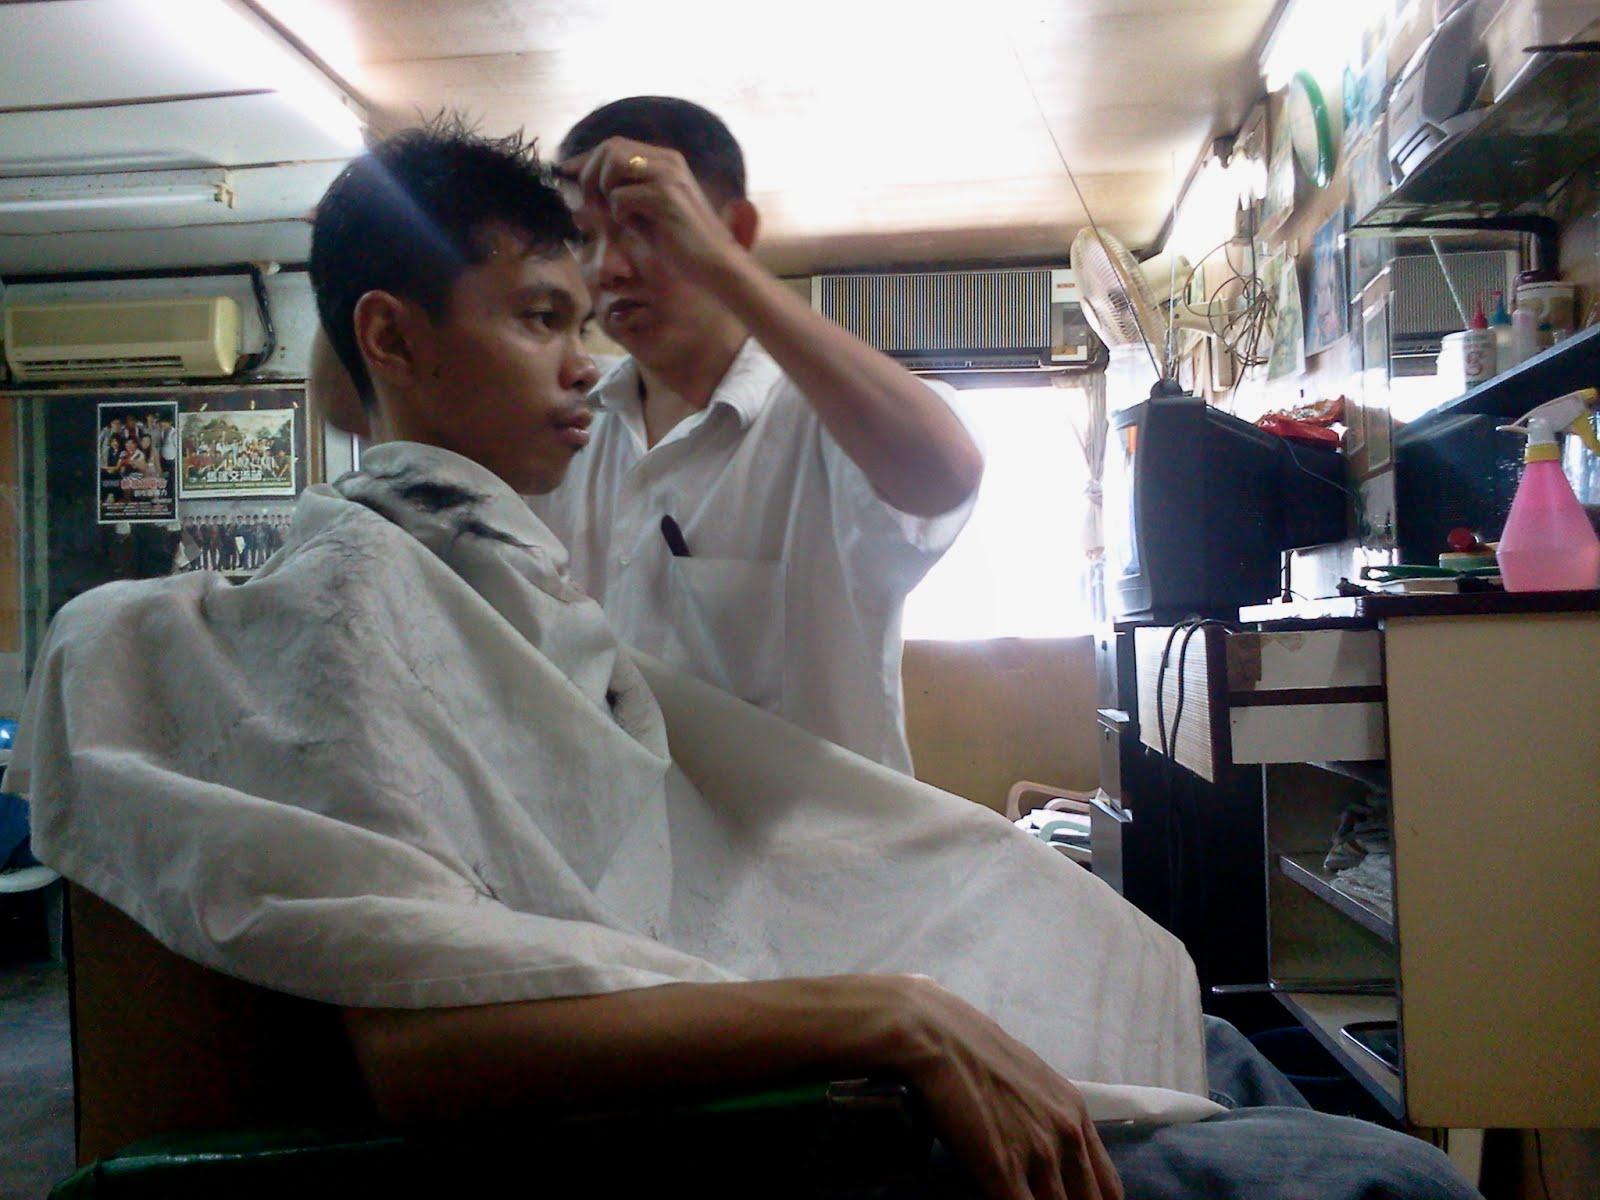 Temankan bakal pengantin gunting rambut lepas jemaat. Terbaeekkk!!!! Ps    blogger buat hal lagi daaa. e50a89a42b